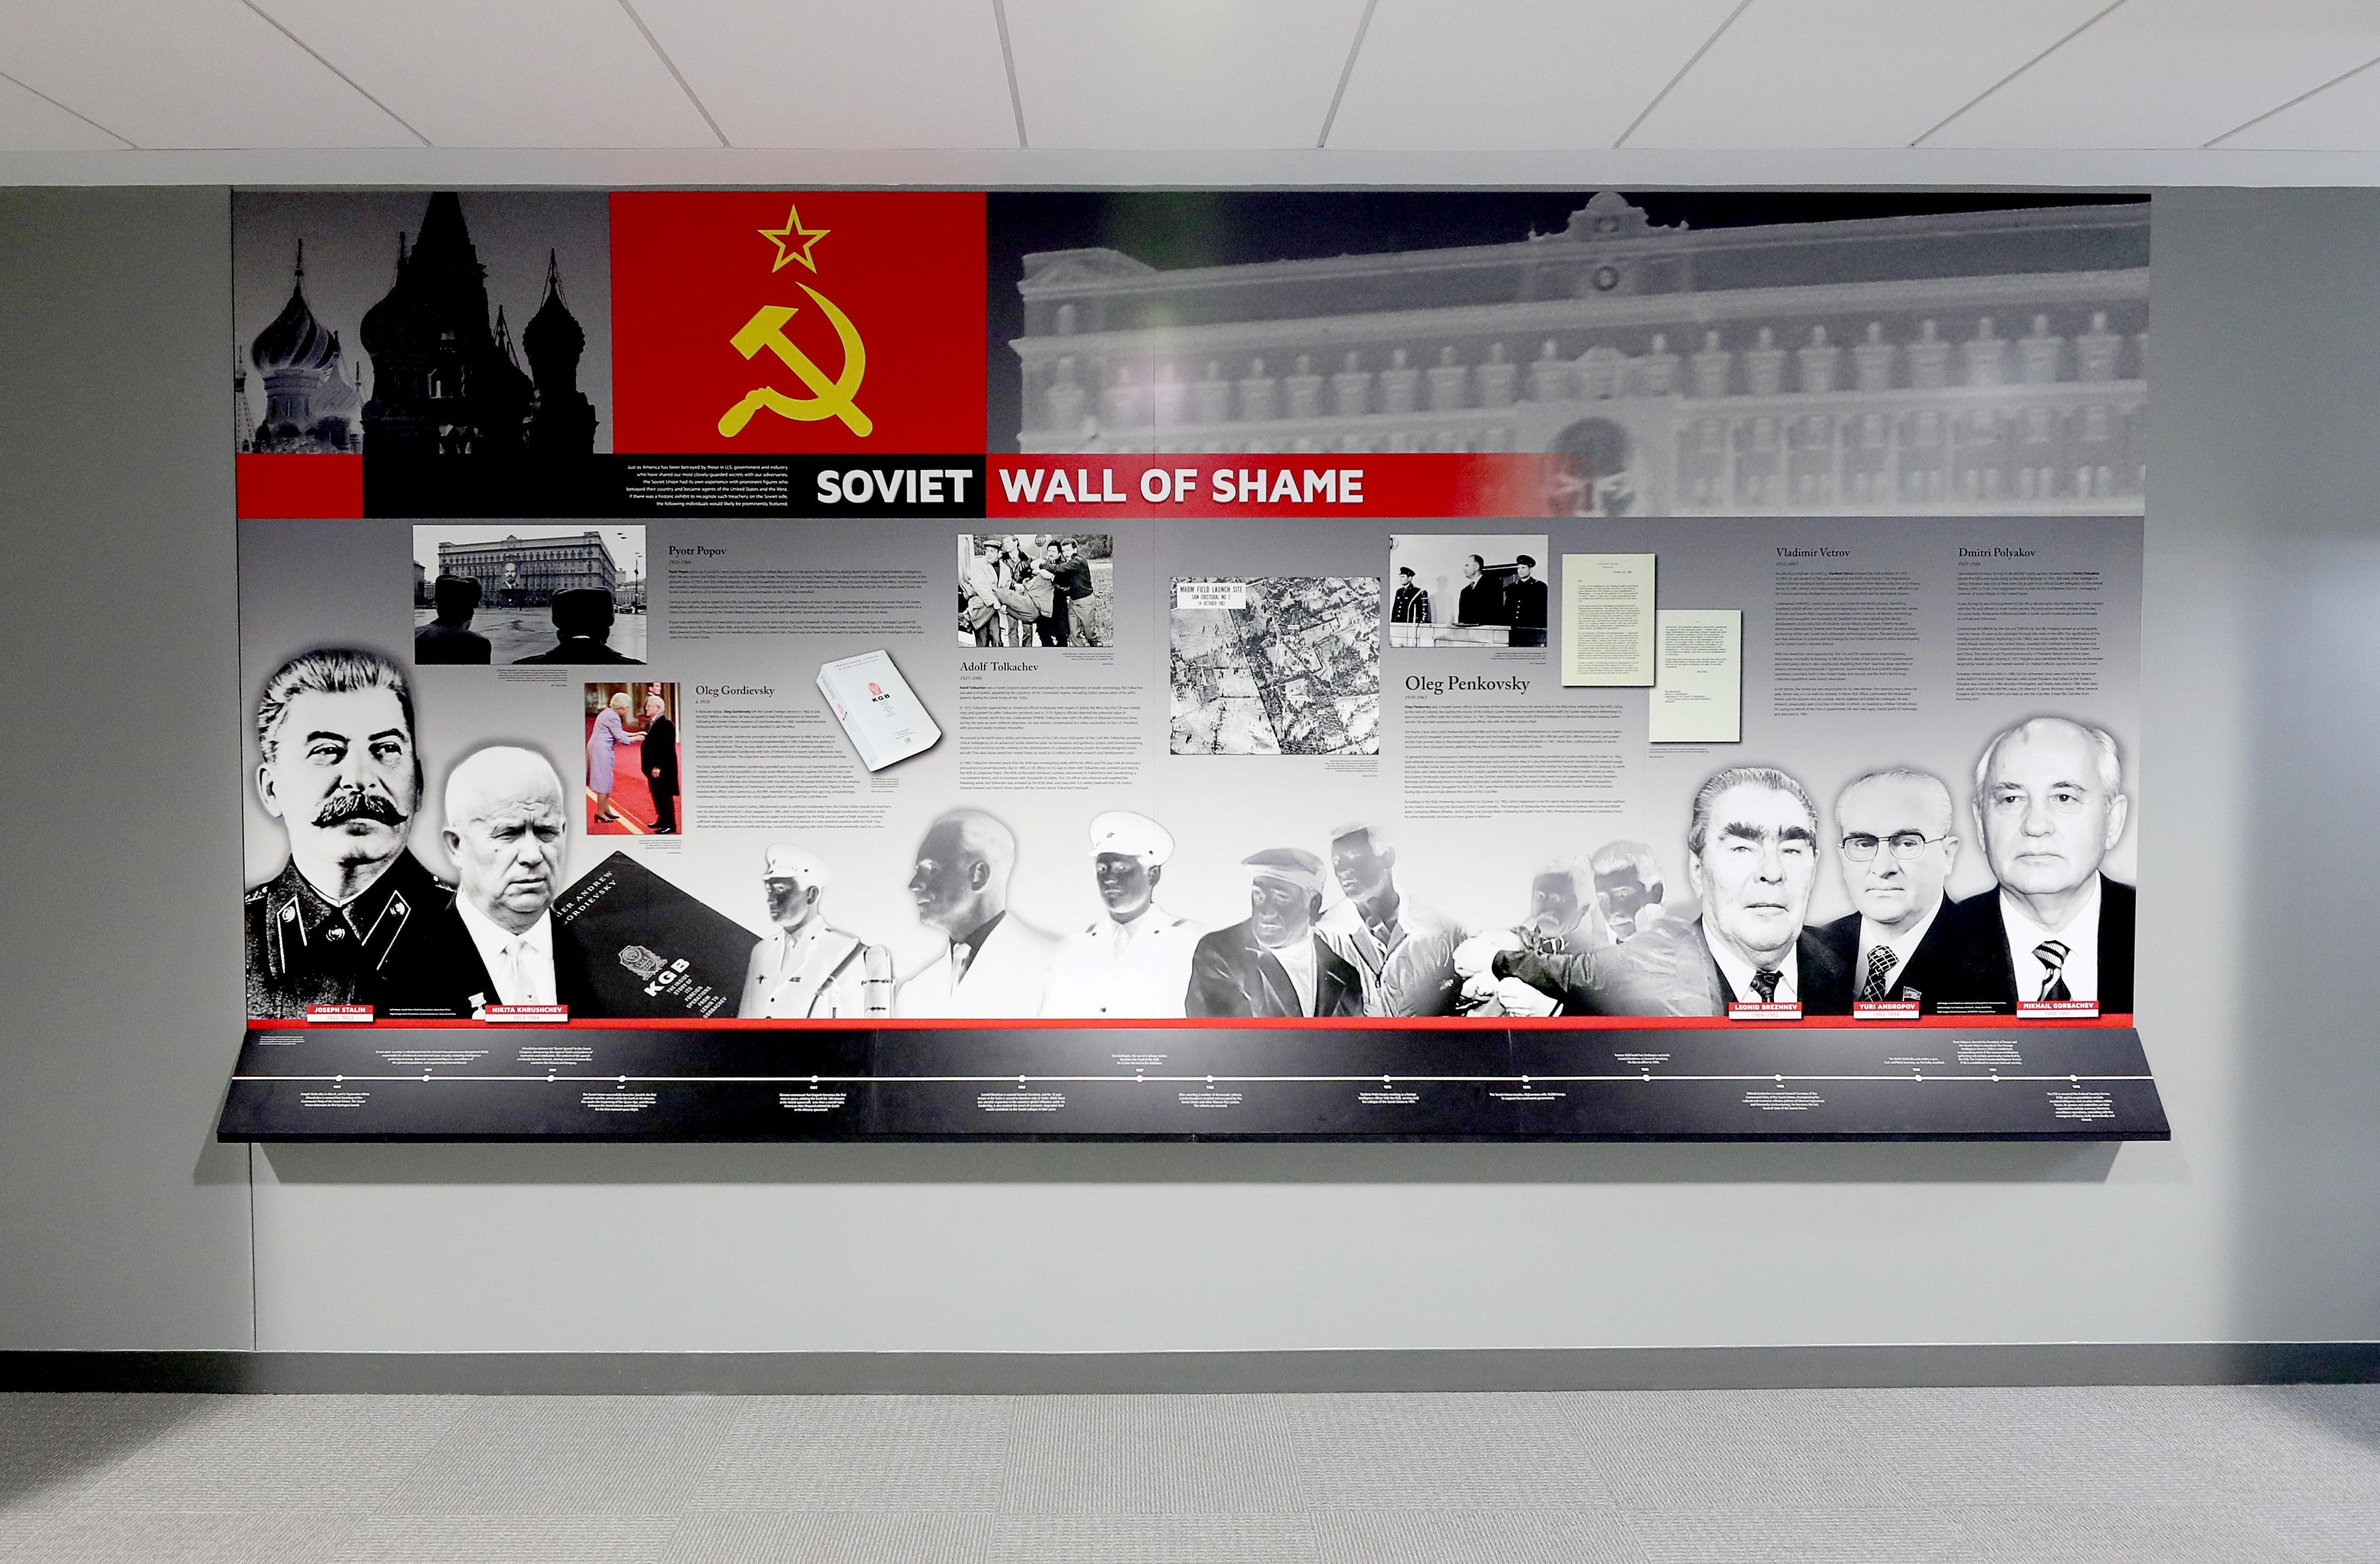 Soviet Wall of Shame